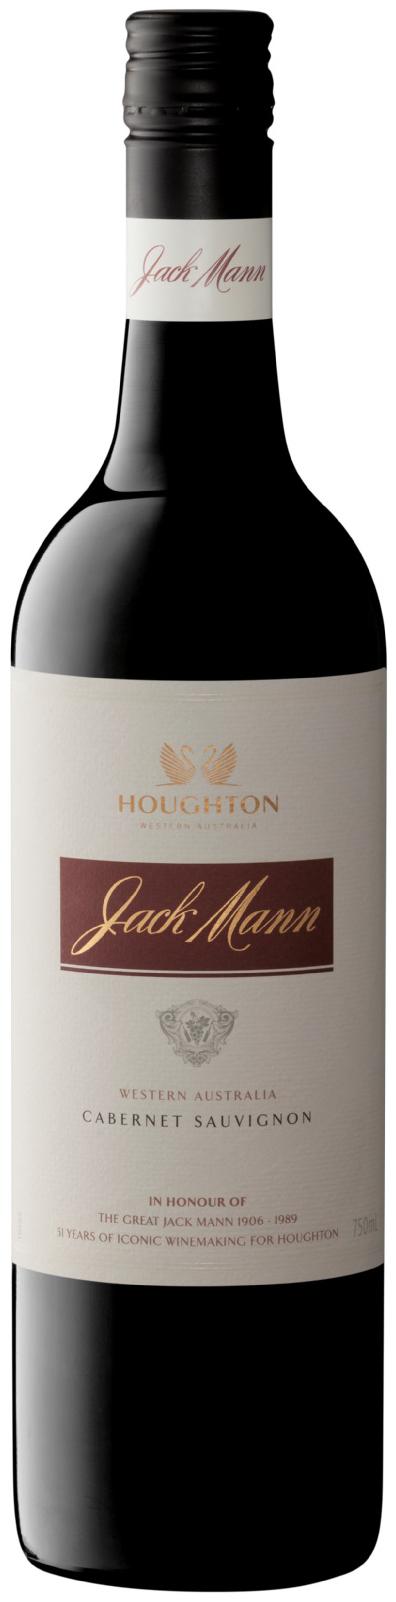 Houghton, Jack Mann Cabernet Sauvignon 2014